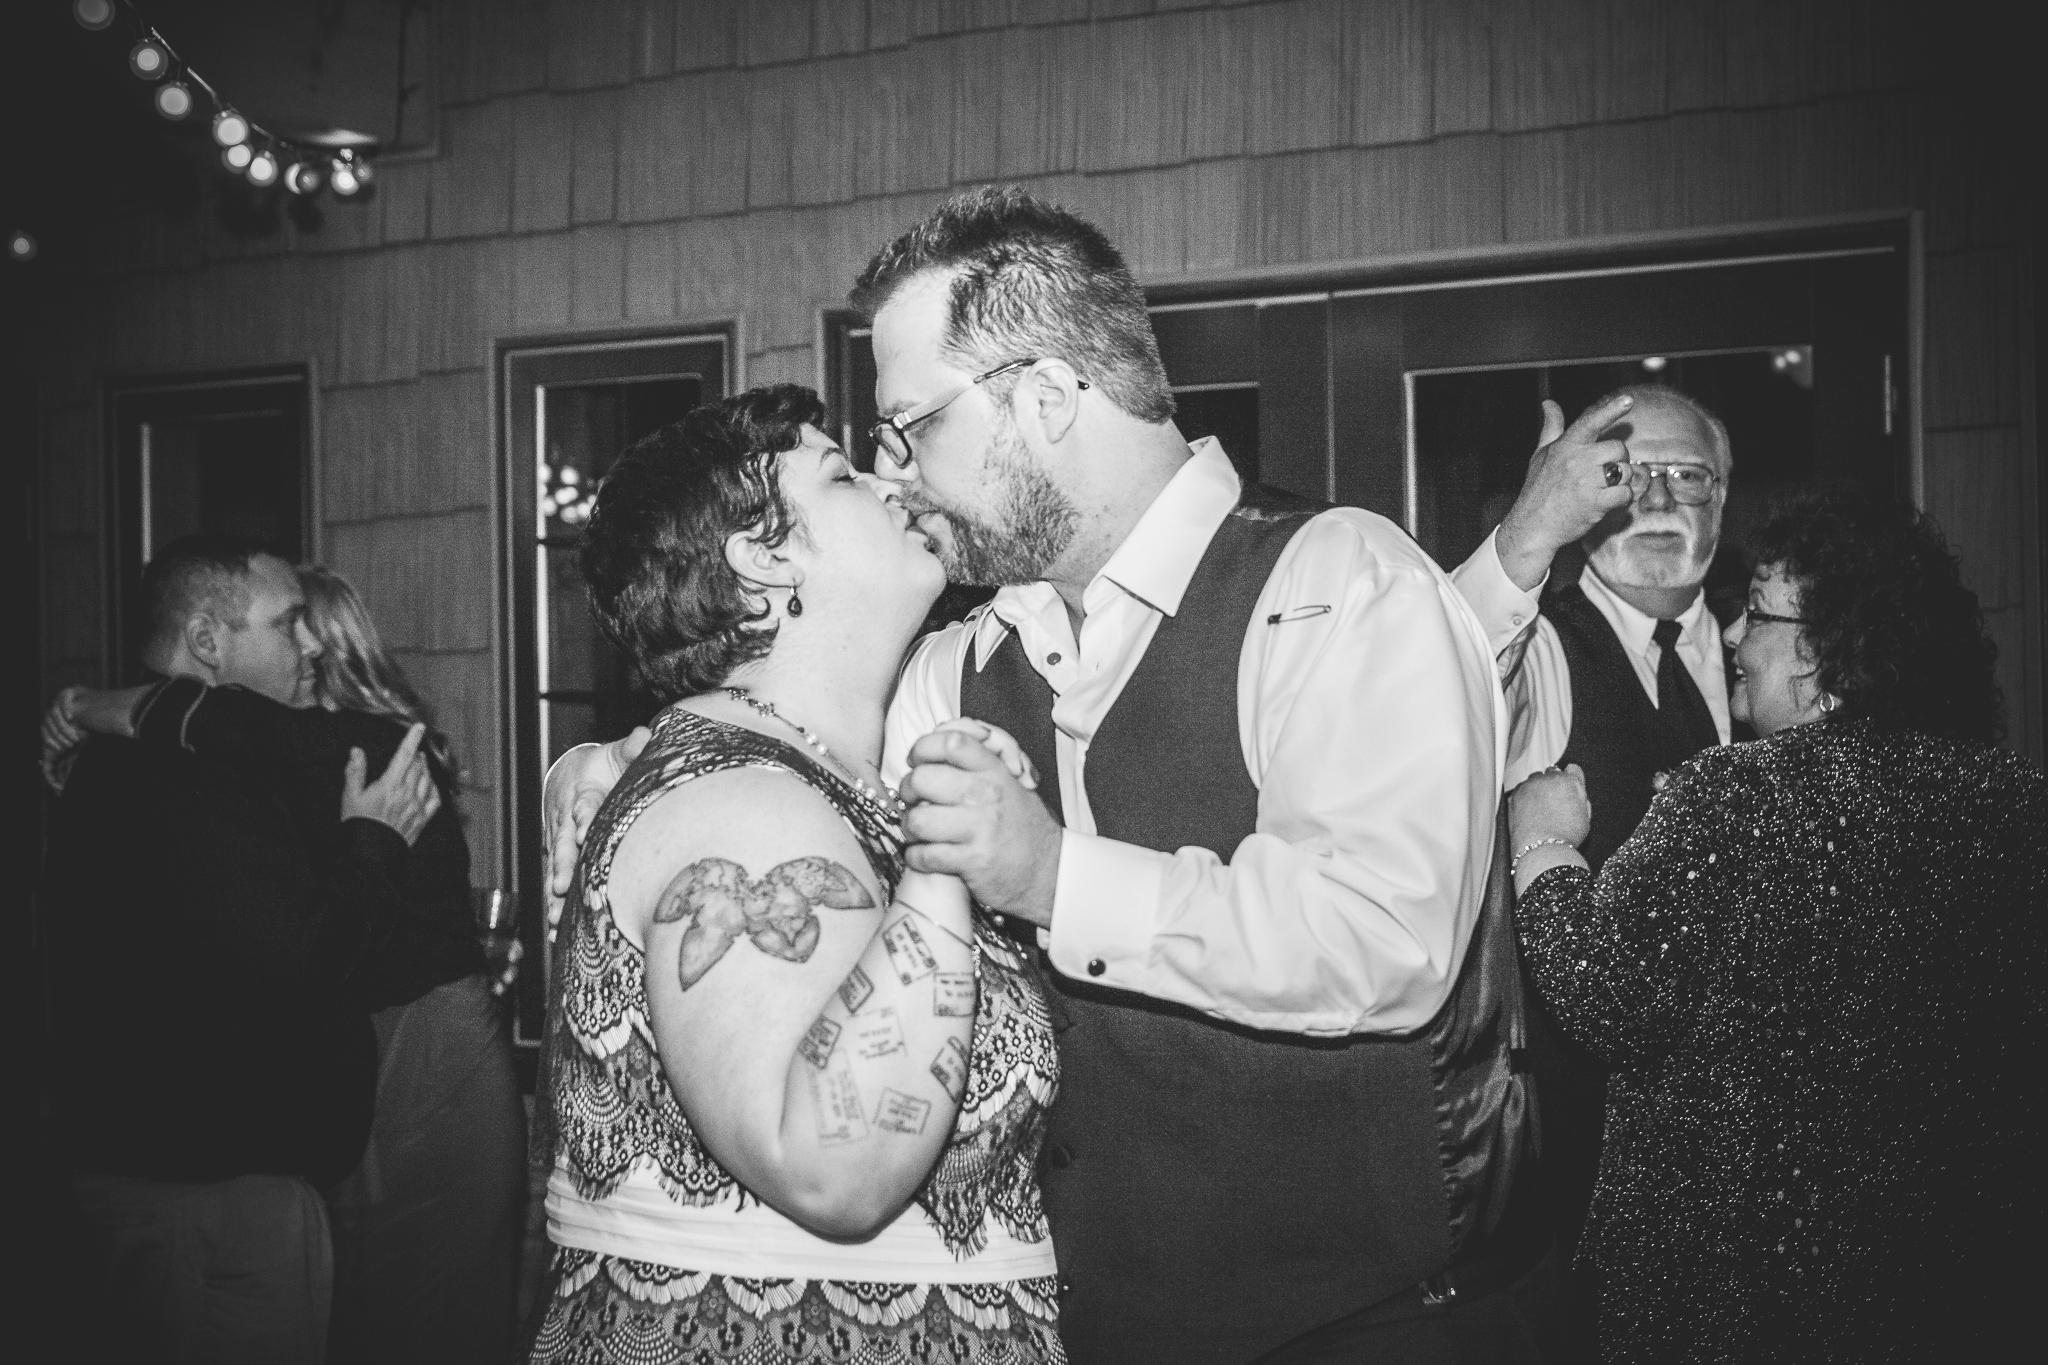 camuglia-whomstudio-chelsea_and_andy-nycphotographer-wedding-brooklyn-buffalo-timberlodge-179-1260.jpg